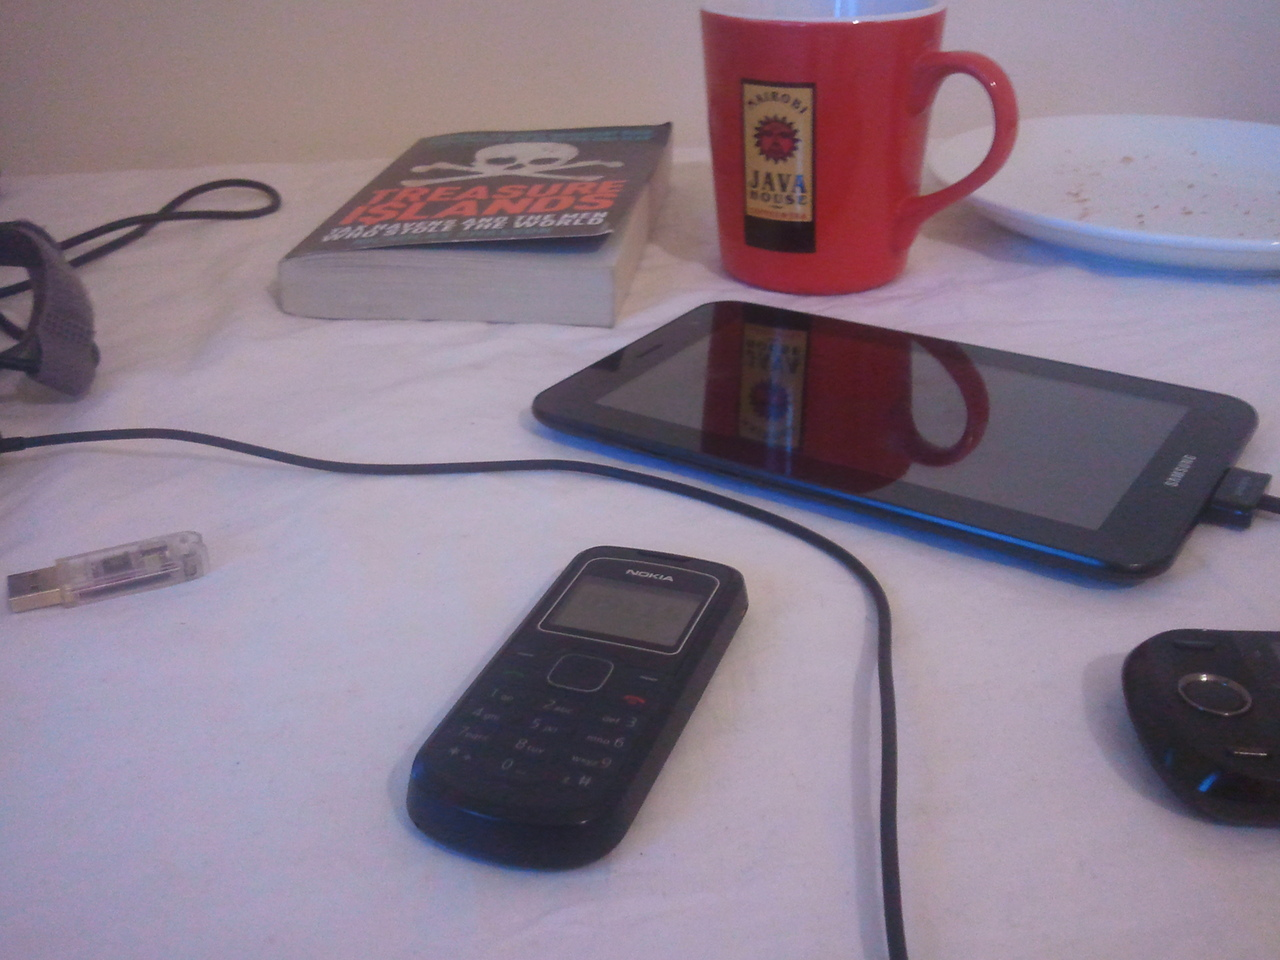 Boring, old, normal Nokia 1202